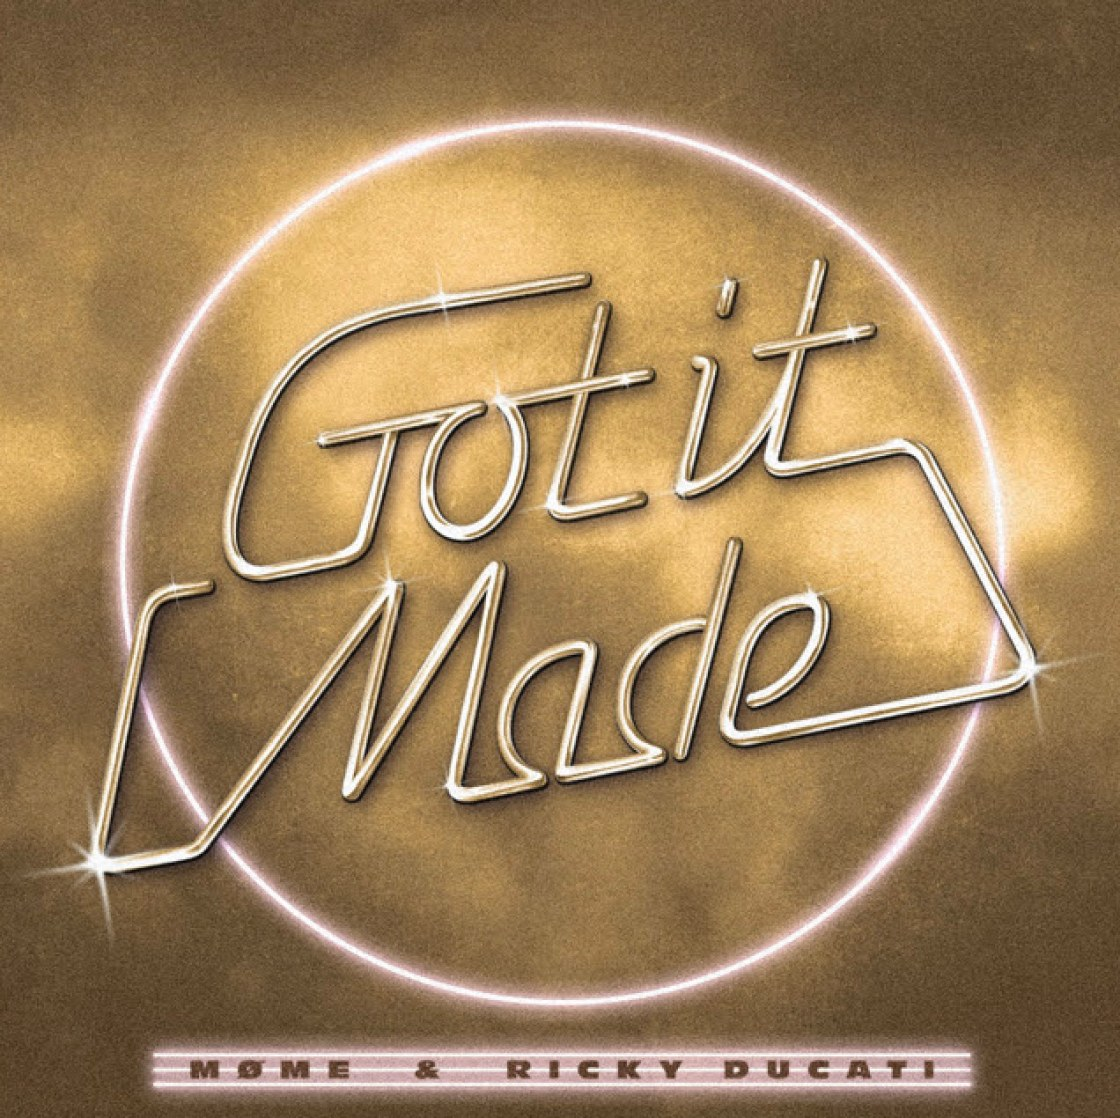 Møme, Ricky Ducati - Got It Made